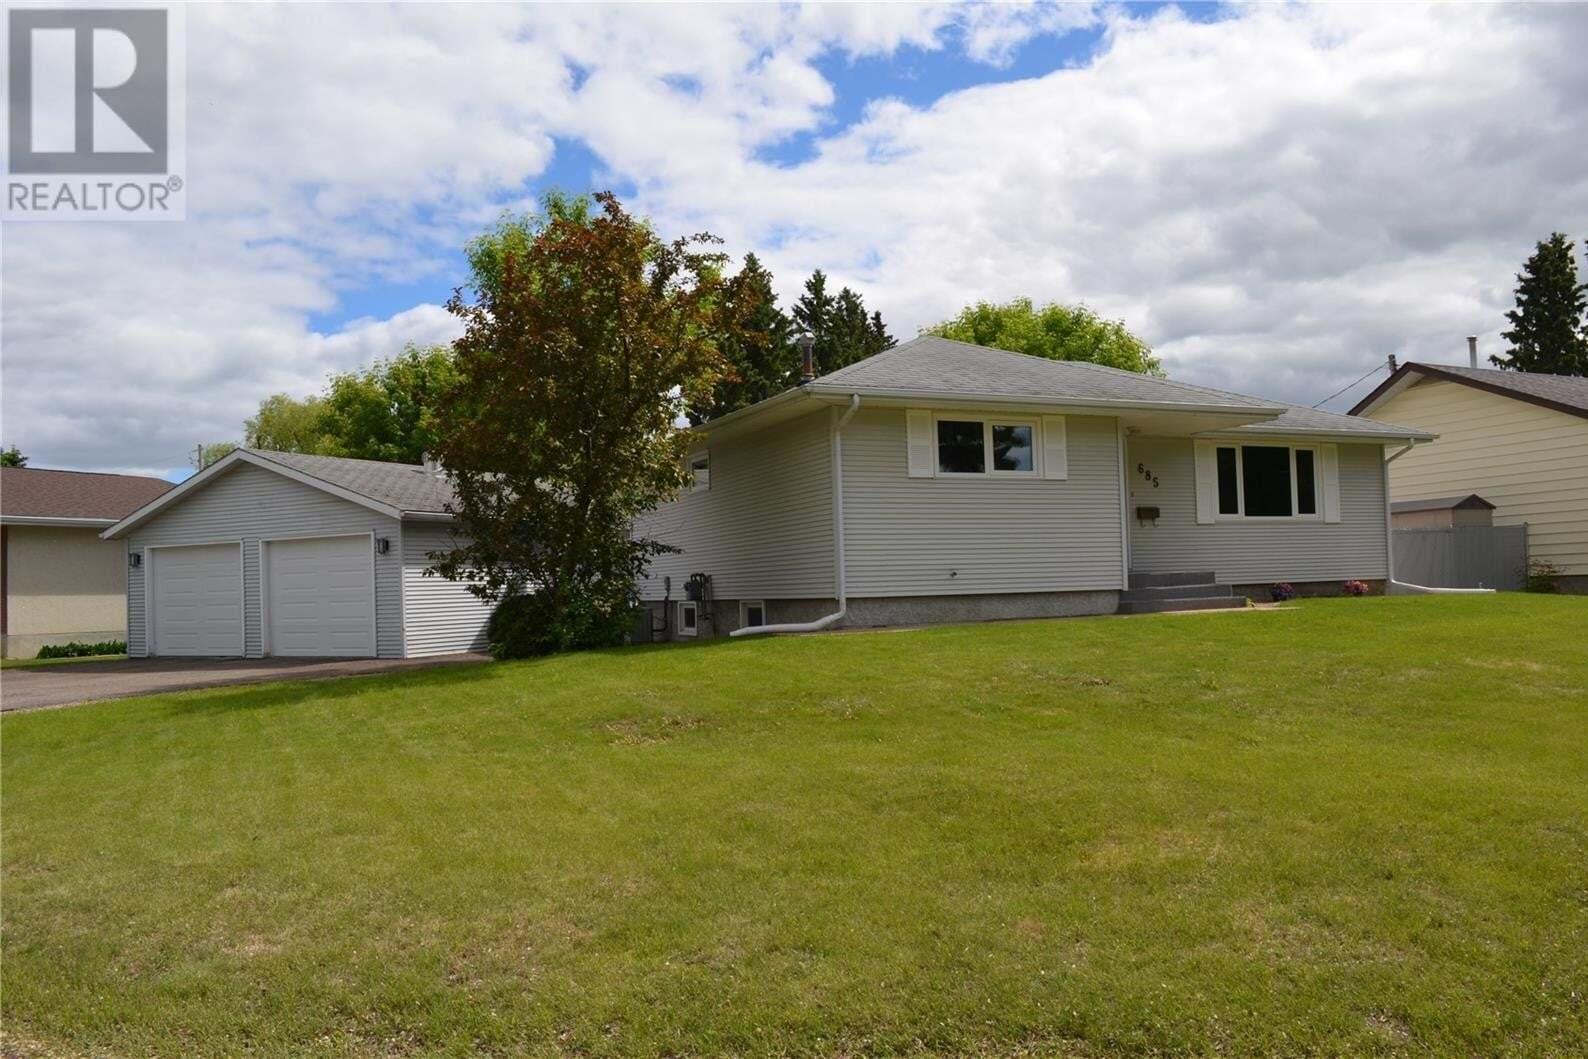 House for sale at 685 River St E Prince Albert Saskatchewan - MLS: SK814047